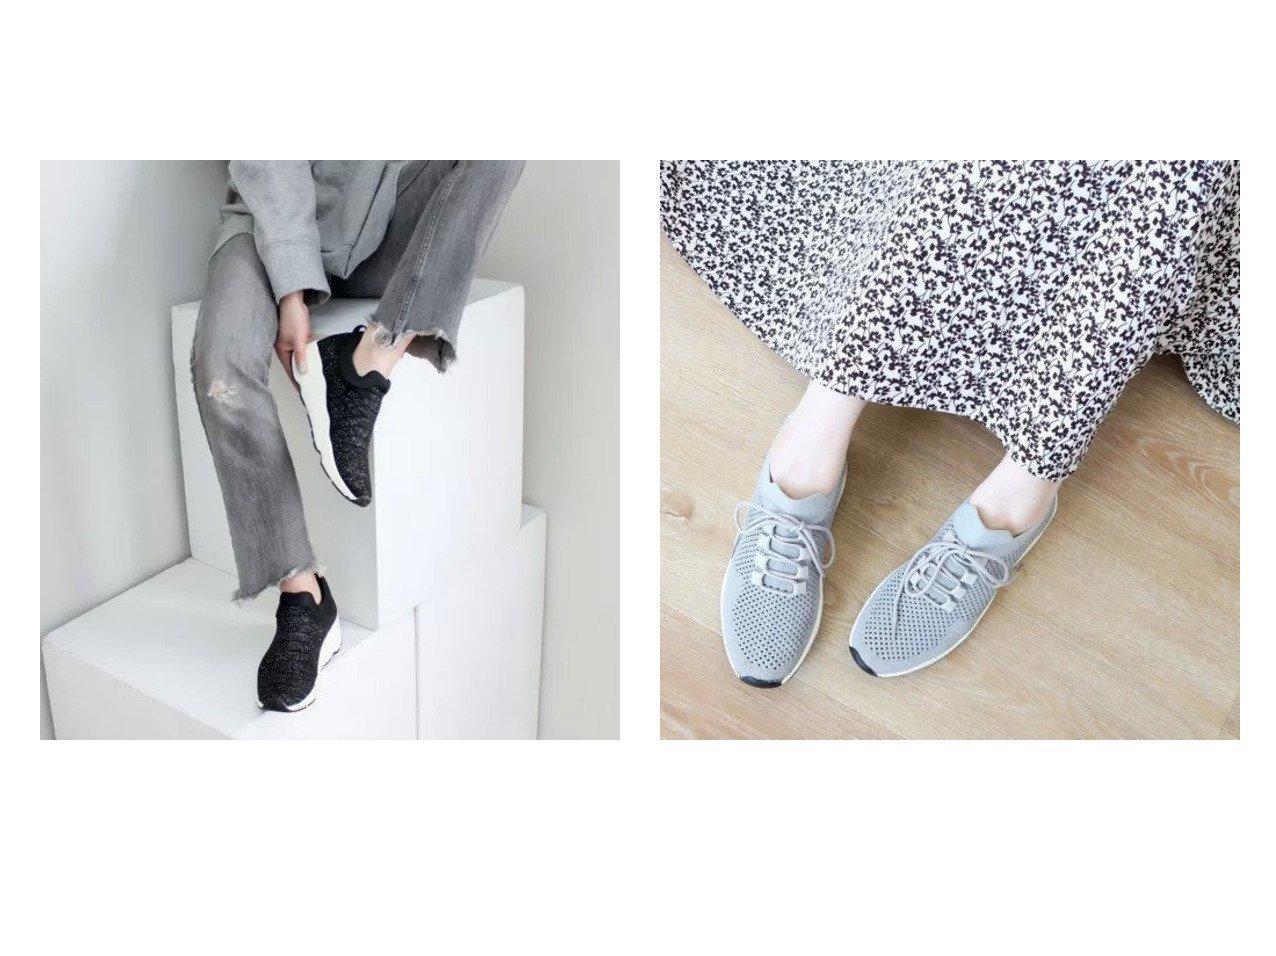 【enchanted/エンチャンテッド】の軽量クロコニットメッシュスニーカー&軽量メッシュレースアップスニーカー シューズ・靴のおすすめ!人気、トレンド・レディースファッションの通販 おすすめで人気の流行・トレンド、ファッションの通販商品 メンズファッション・キッズファッション・インテリア・家具・レディースファッション・服の通販 founy(ファニー) https://founy.com/ ファッション Fashion レディースファッション WOMEN シューズ スニーカー メッシュ 軽量 |ID:crp329100000022556